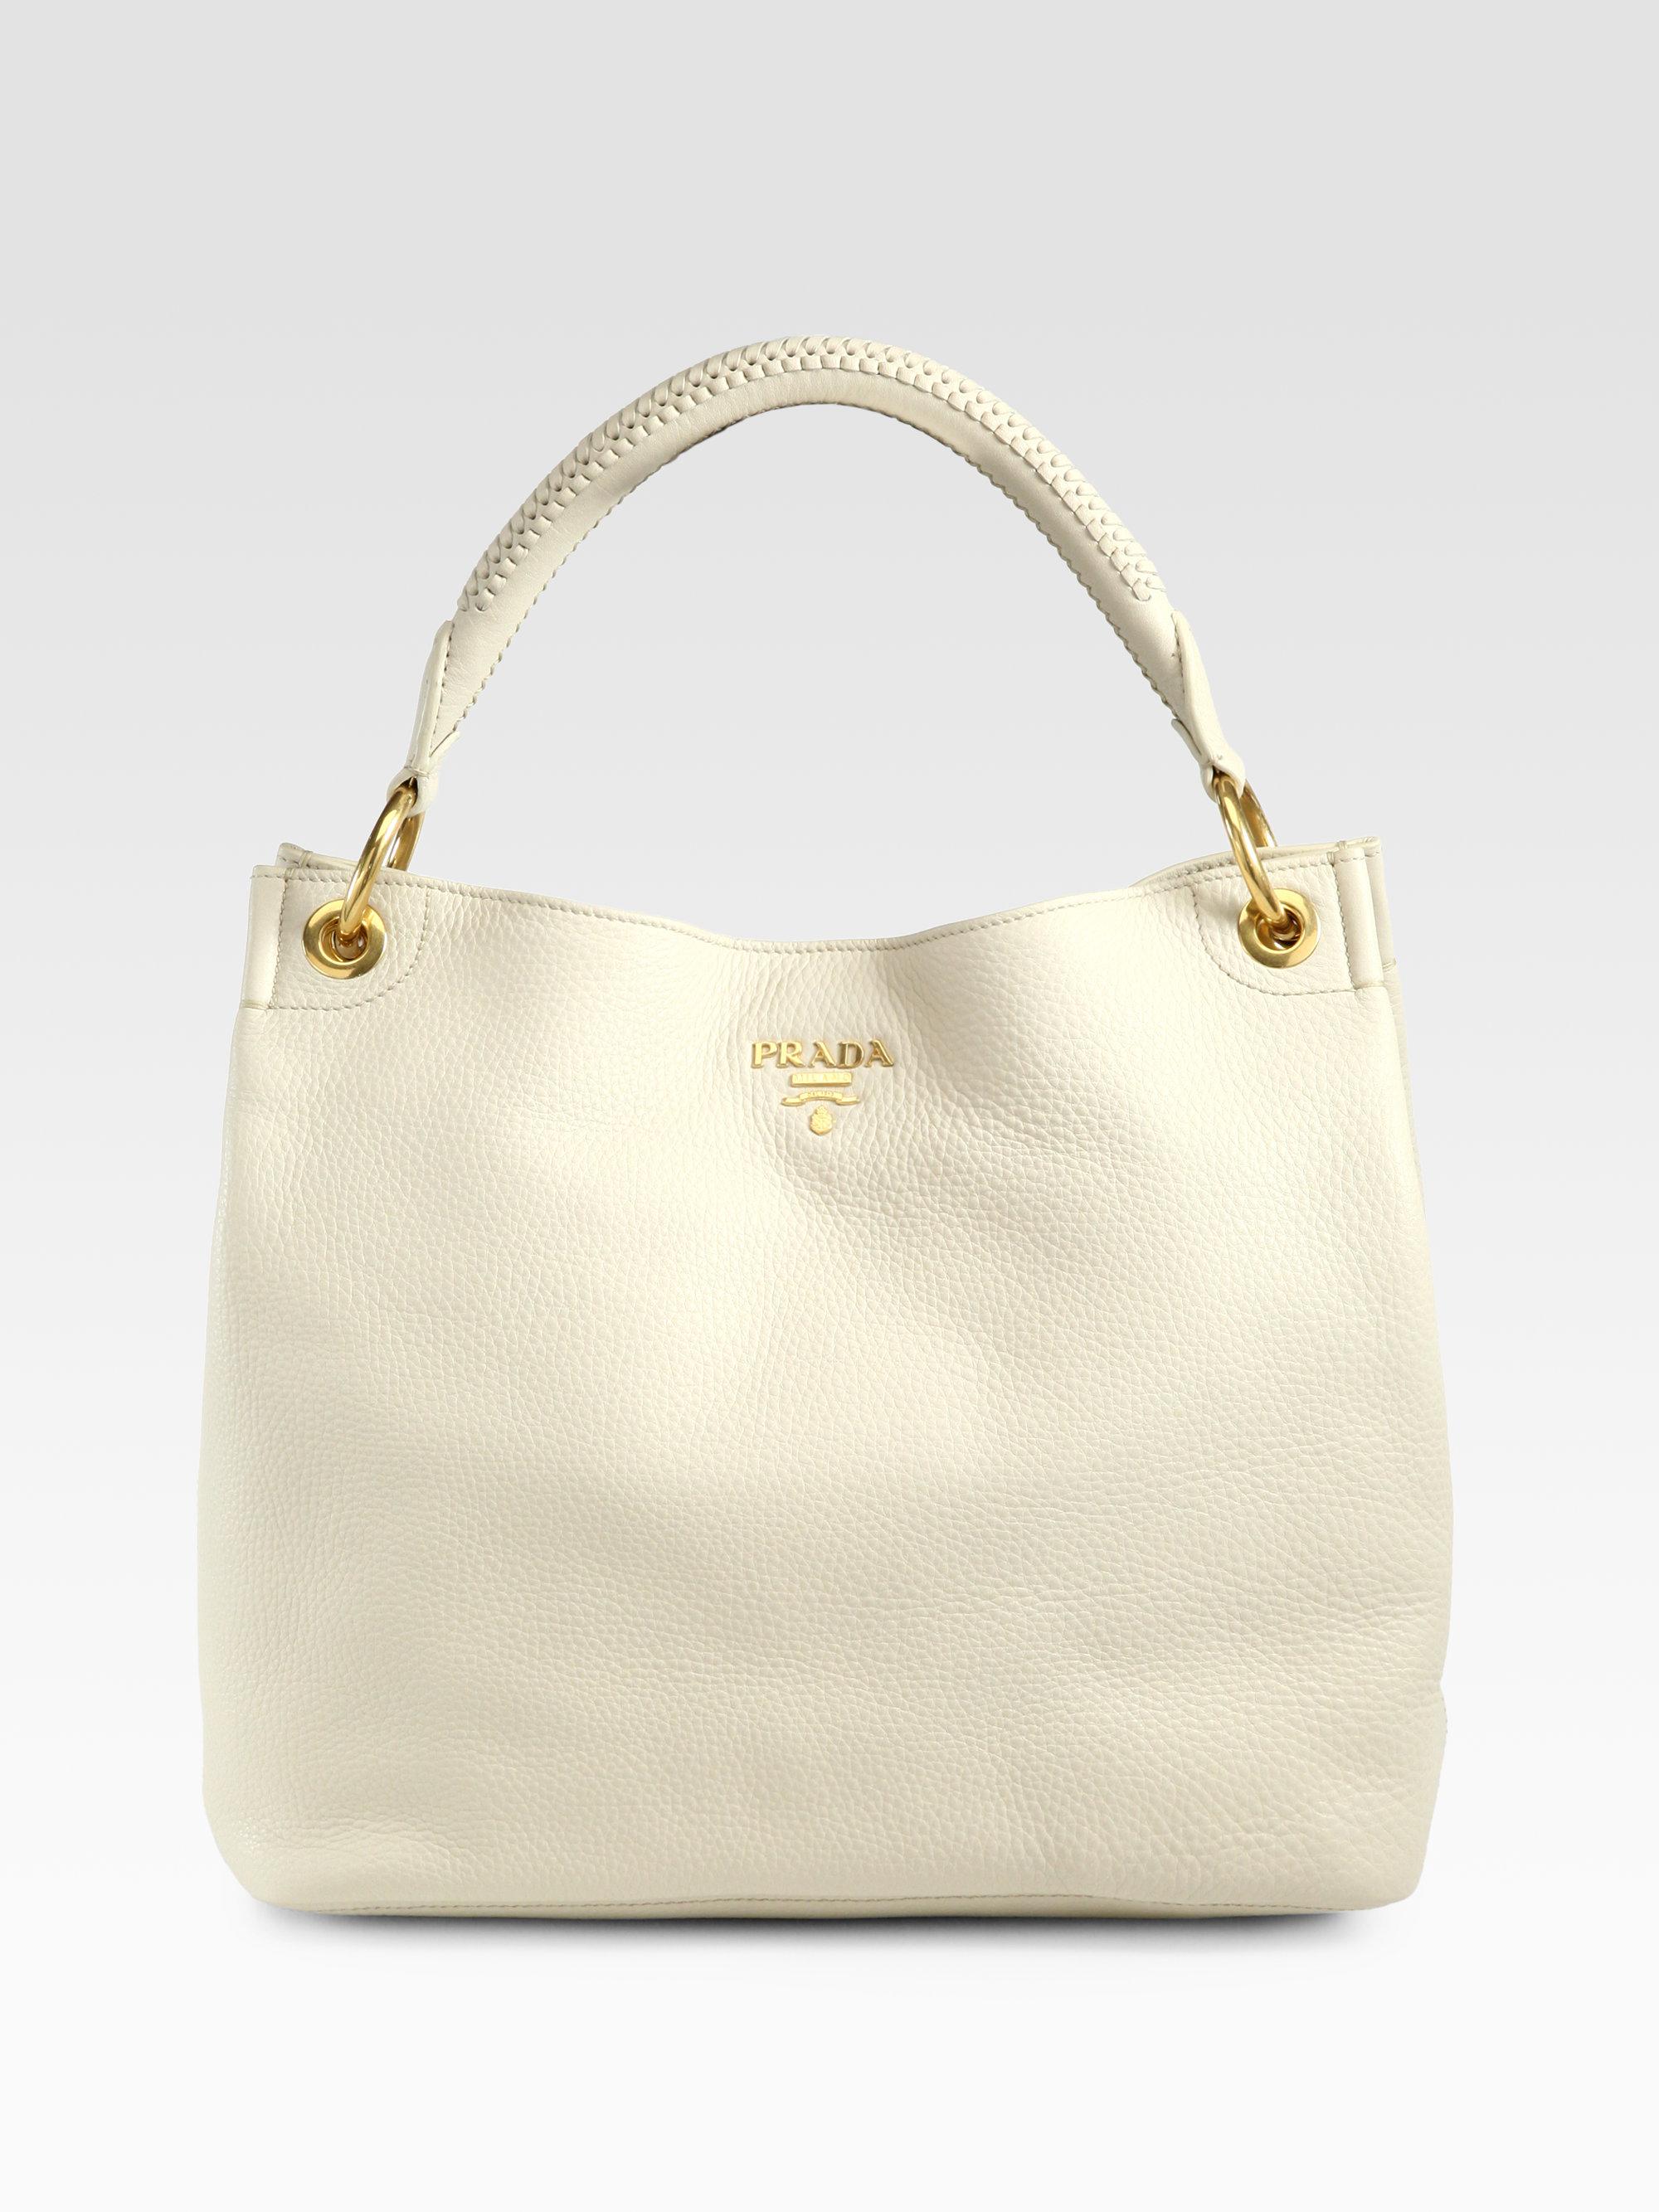 prada purse replica - Prada Vitello Daino Hobo Bag in Beige (TALCO-WHITE) | Lyst